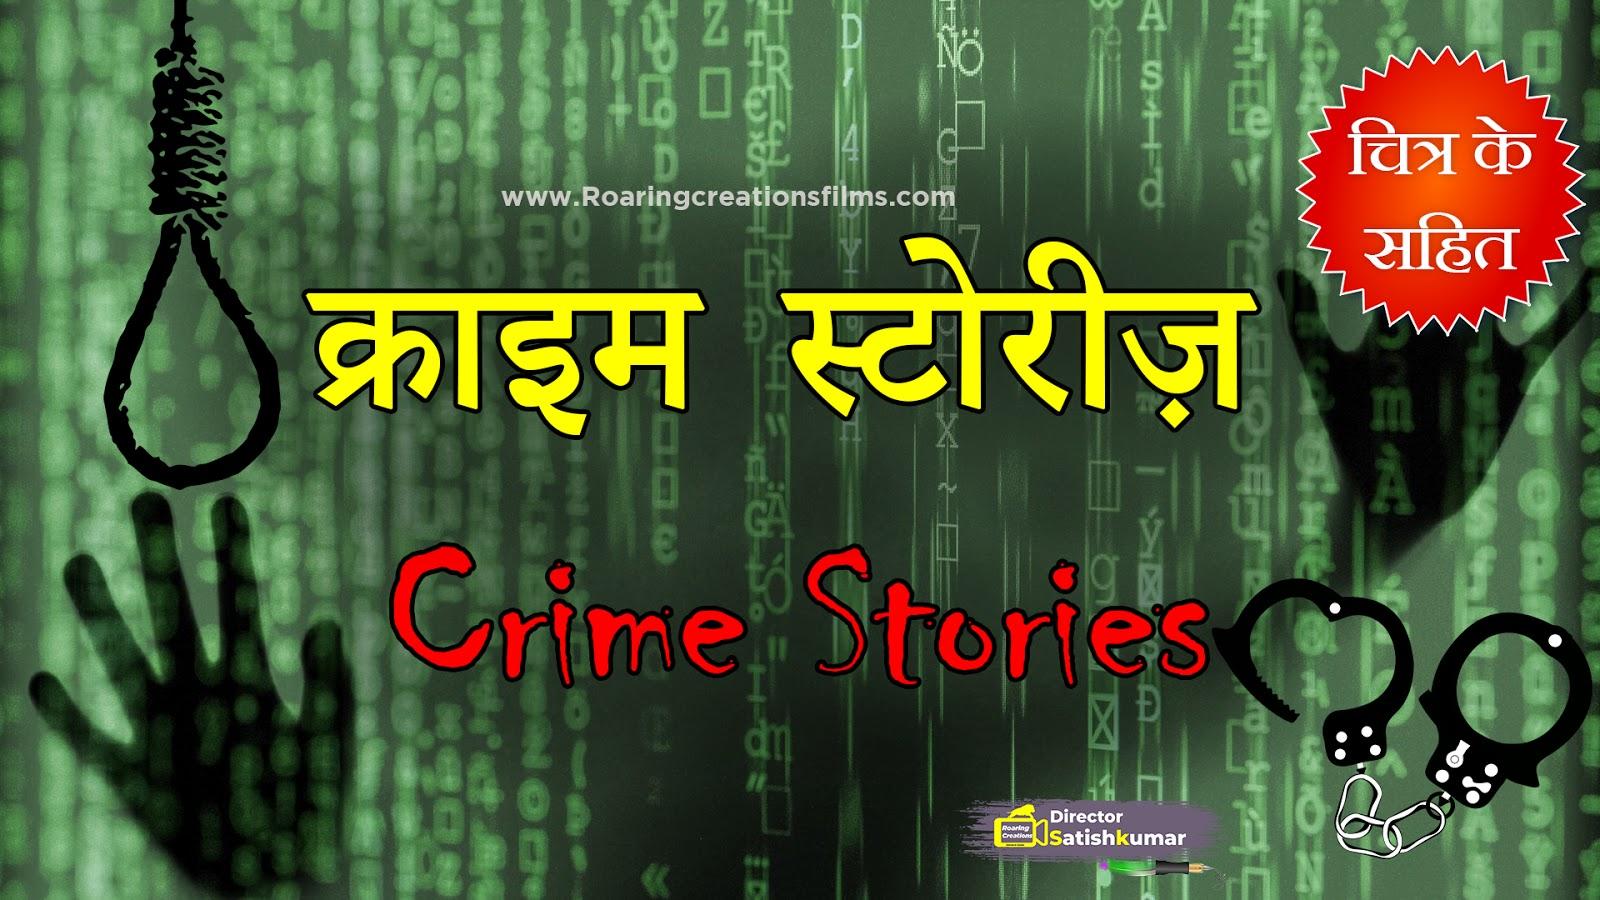 क्राइम स्टोरीज़ - Crime Stories in Hindi - Crime Story Hindi